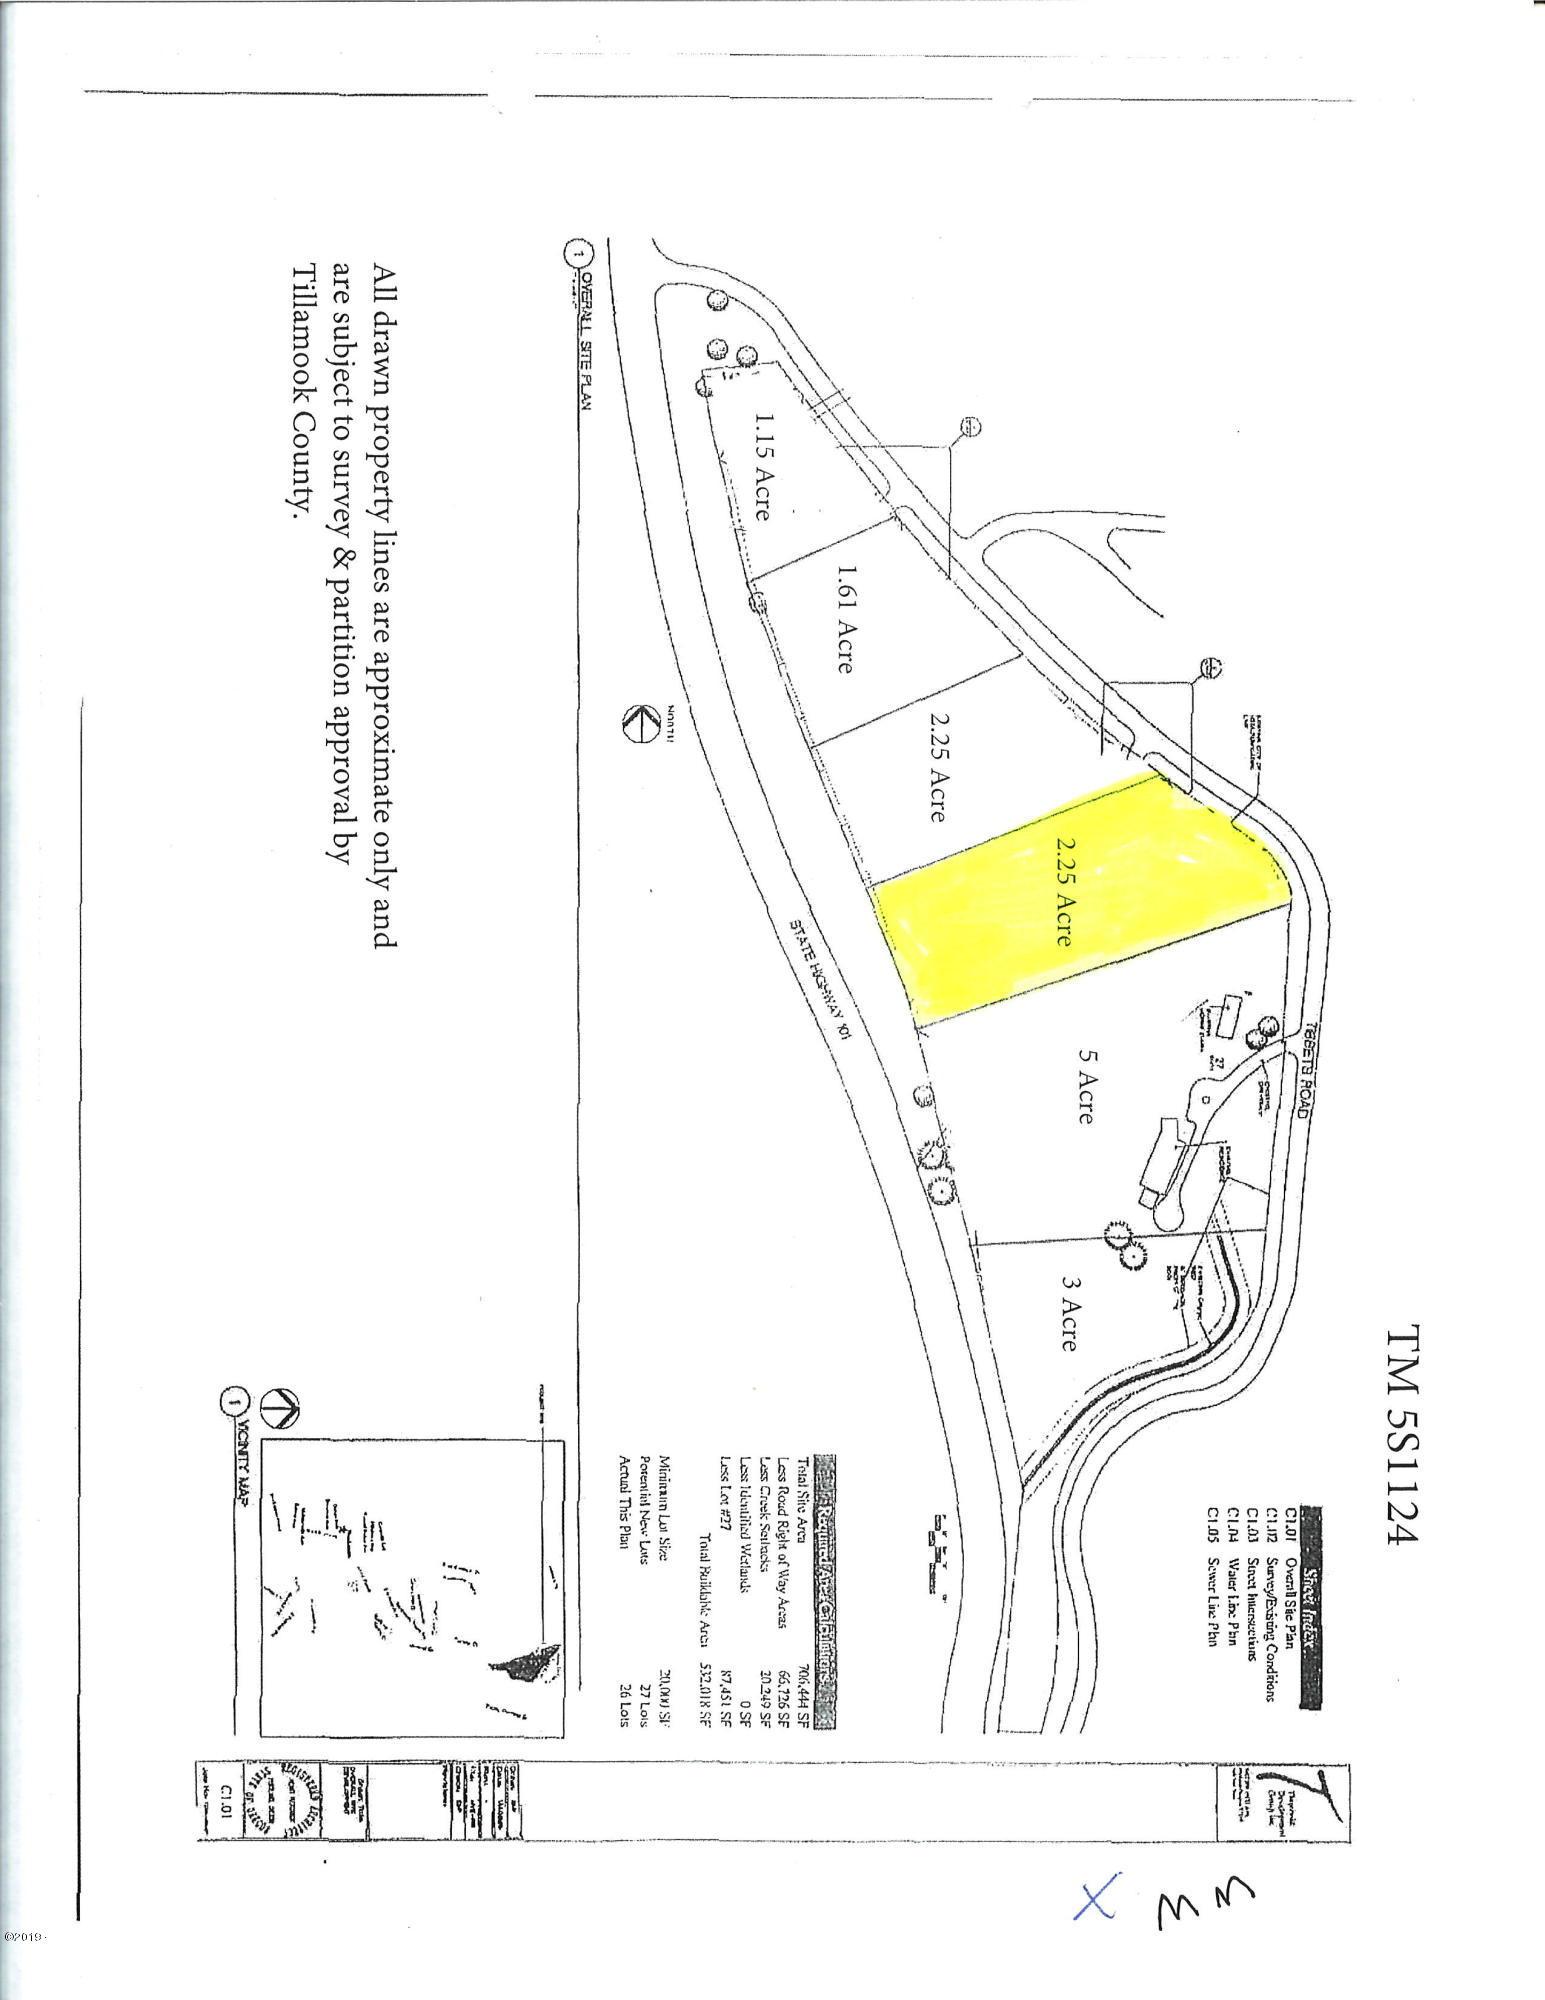 45000 BLK Tibbetts Rd, Neskowin, OR 97149 - 2.25 acres 2